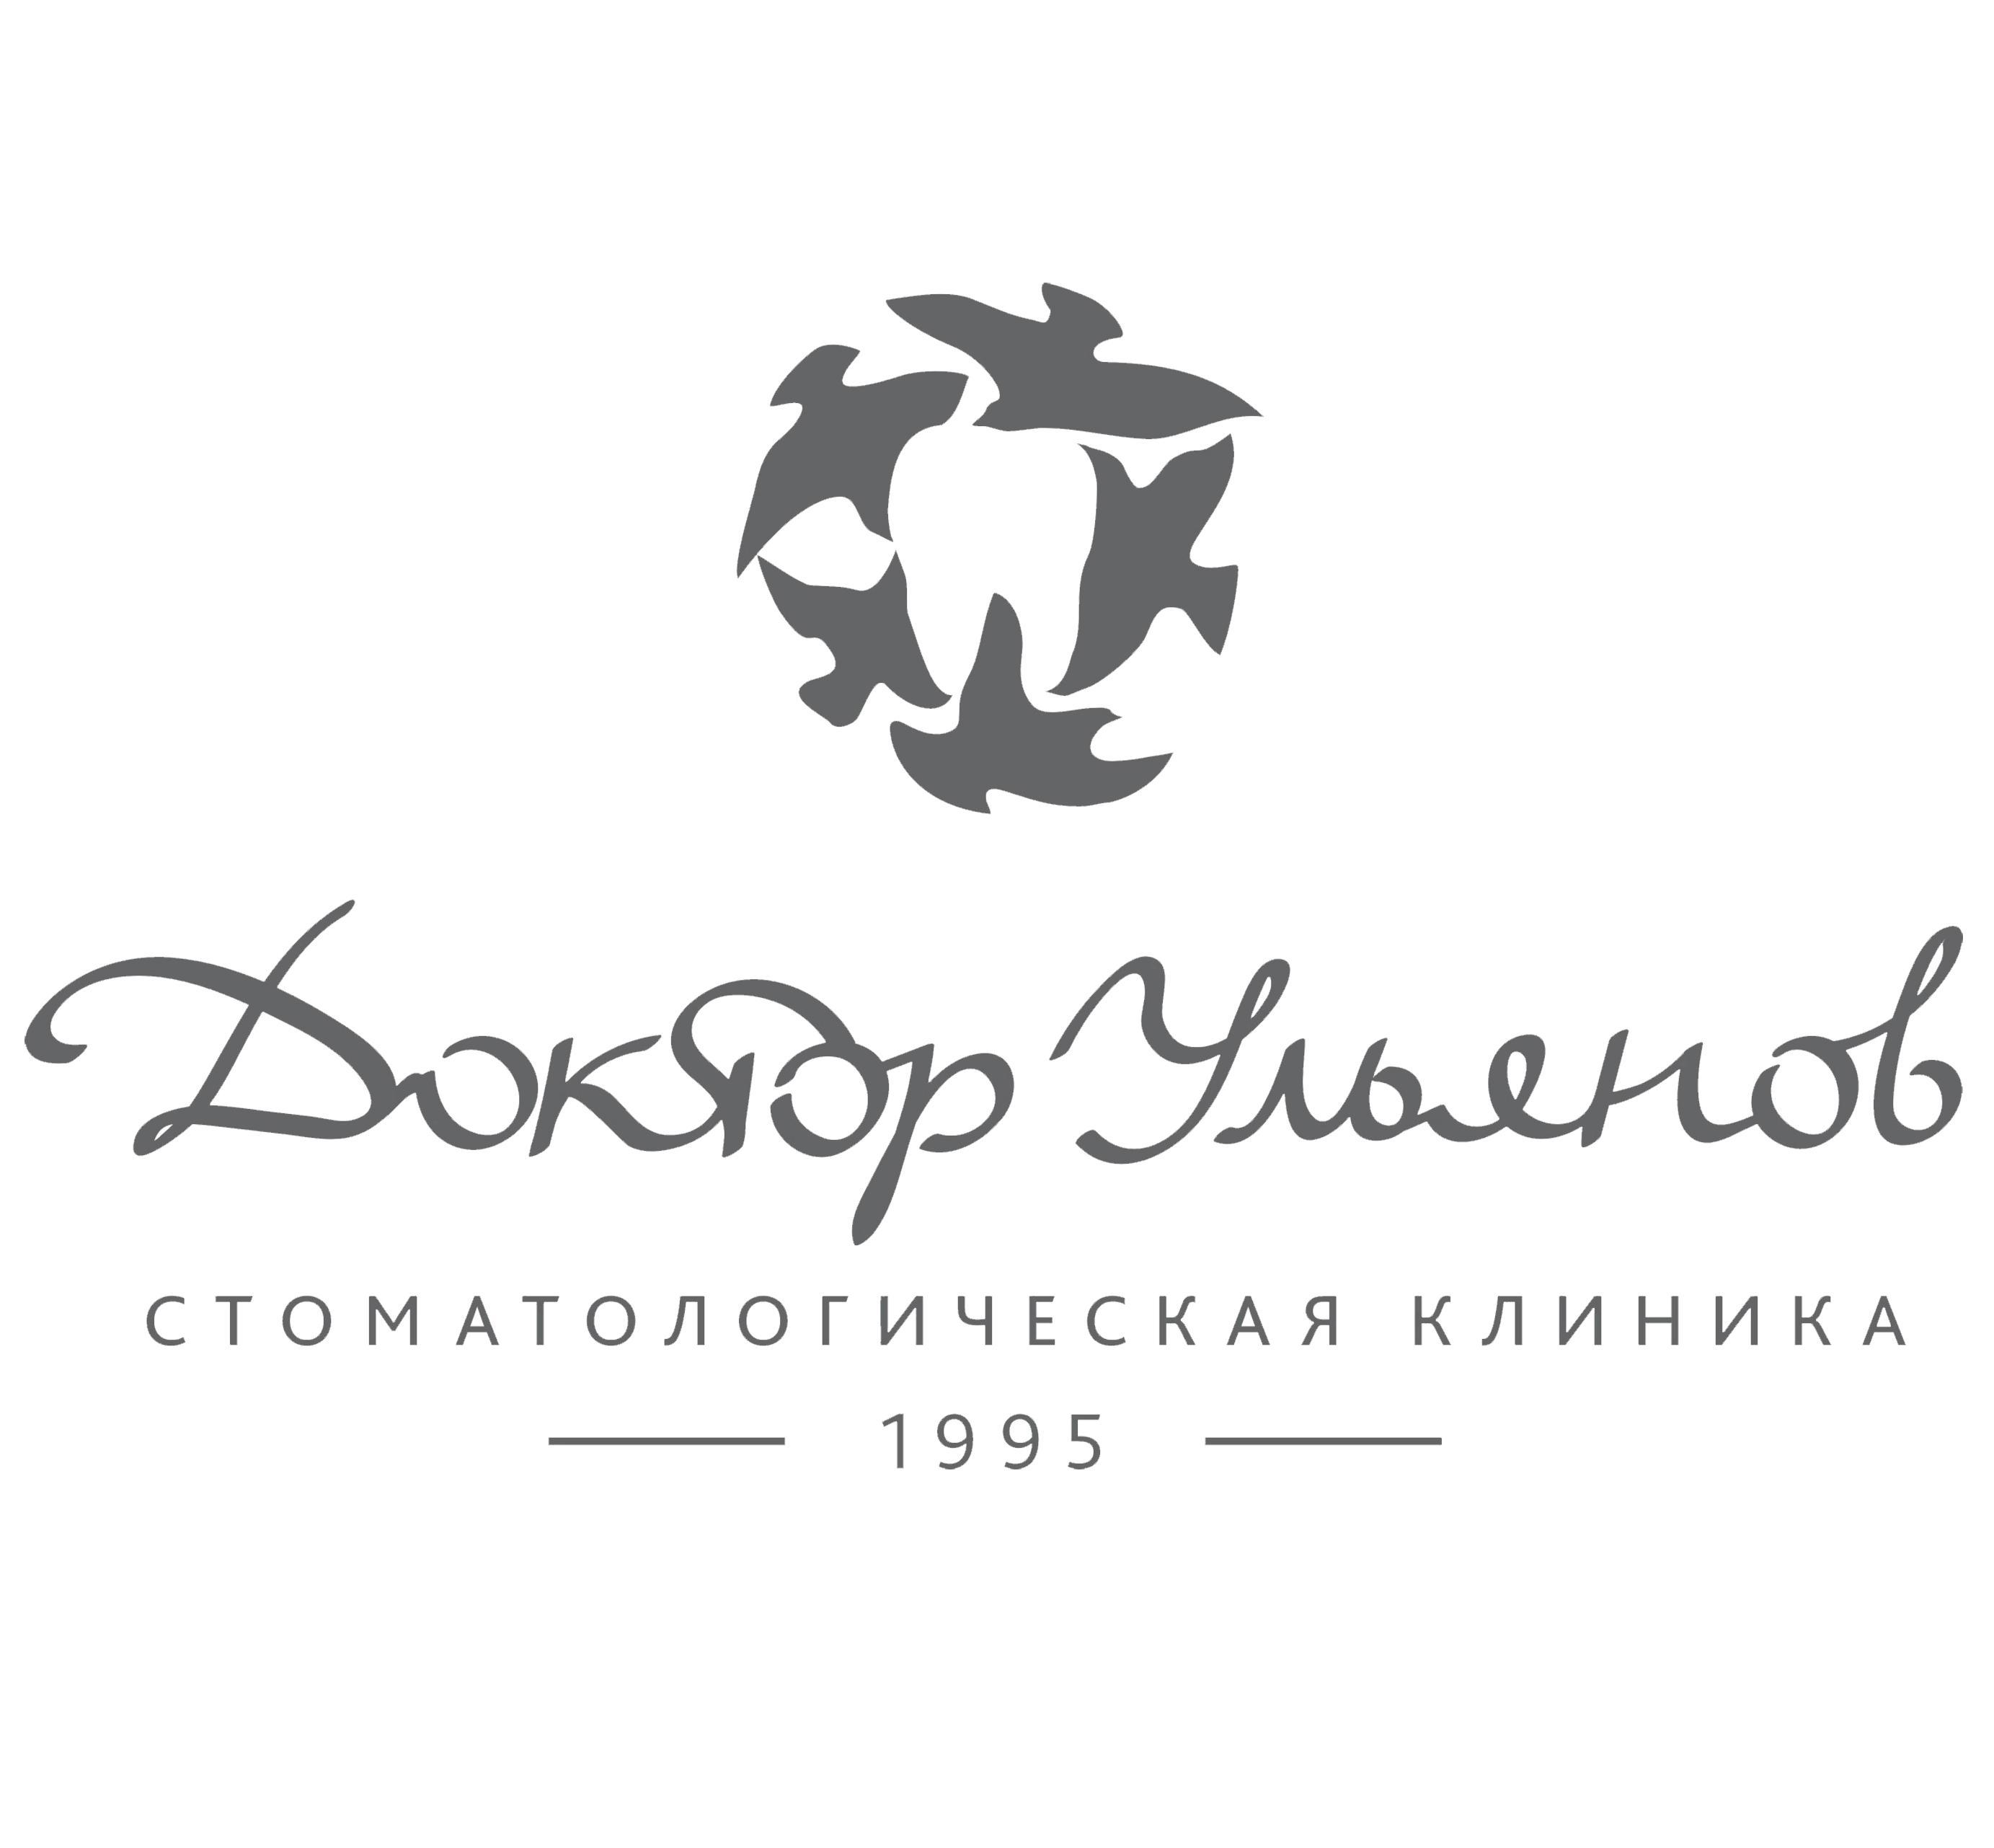 Доктор Ульянов логотип